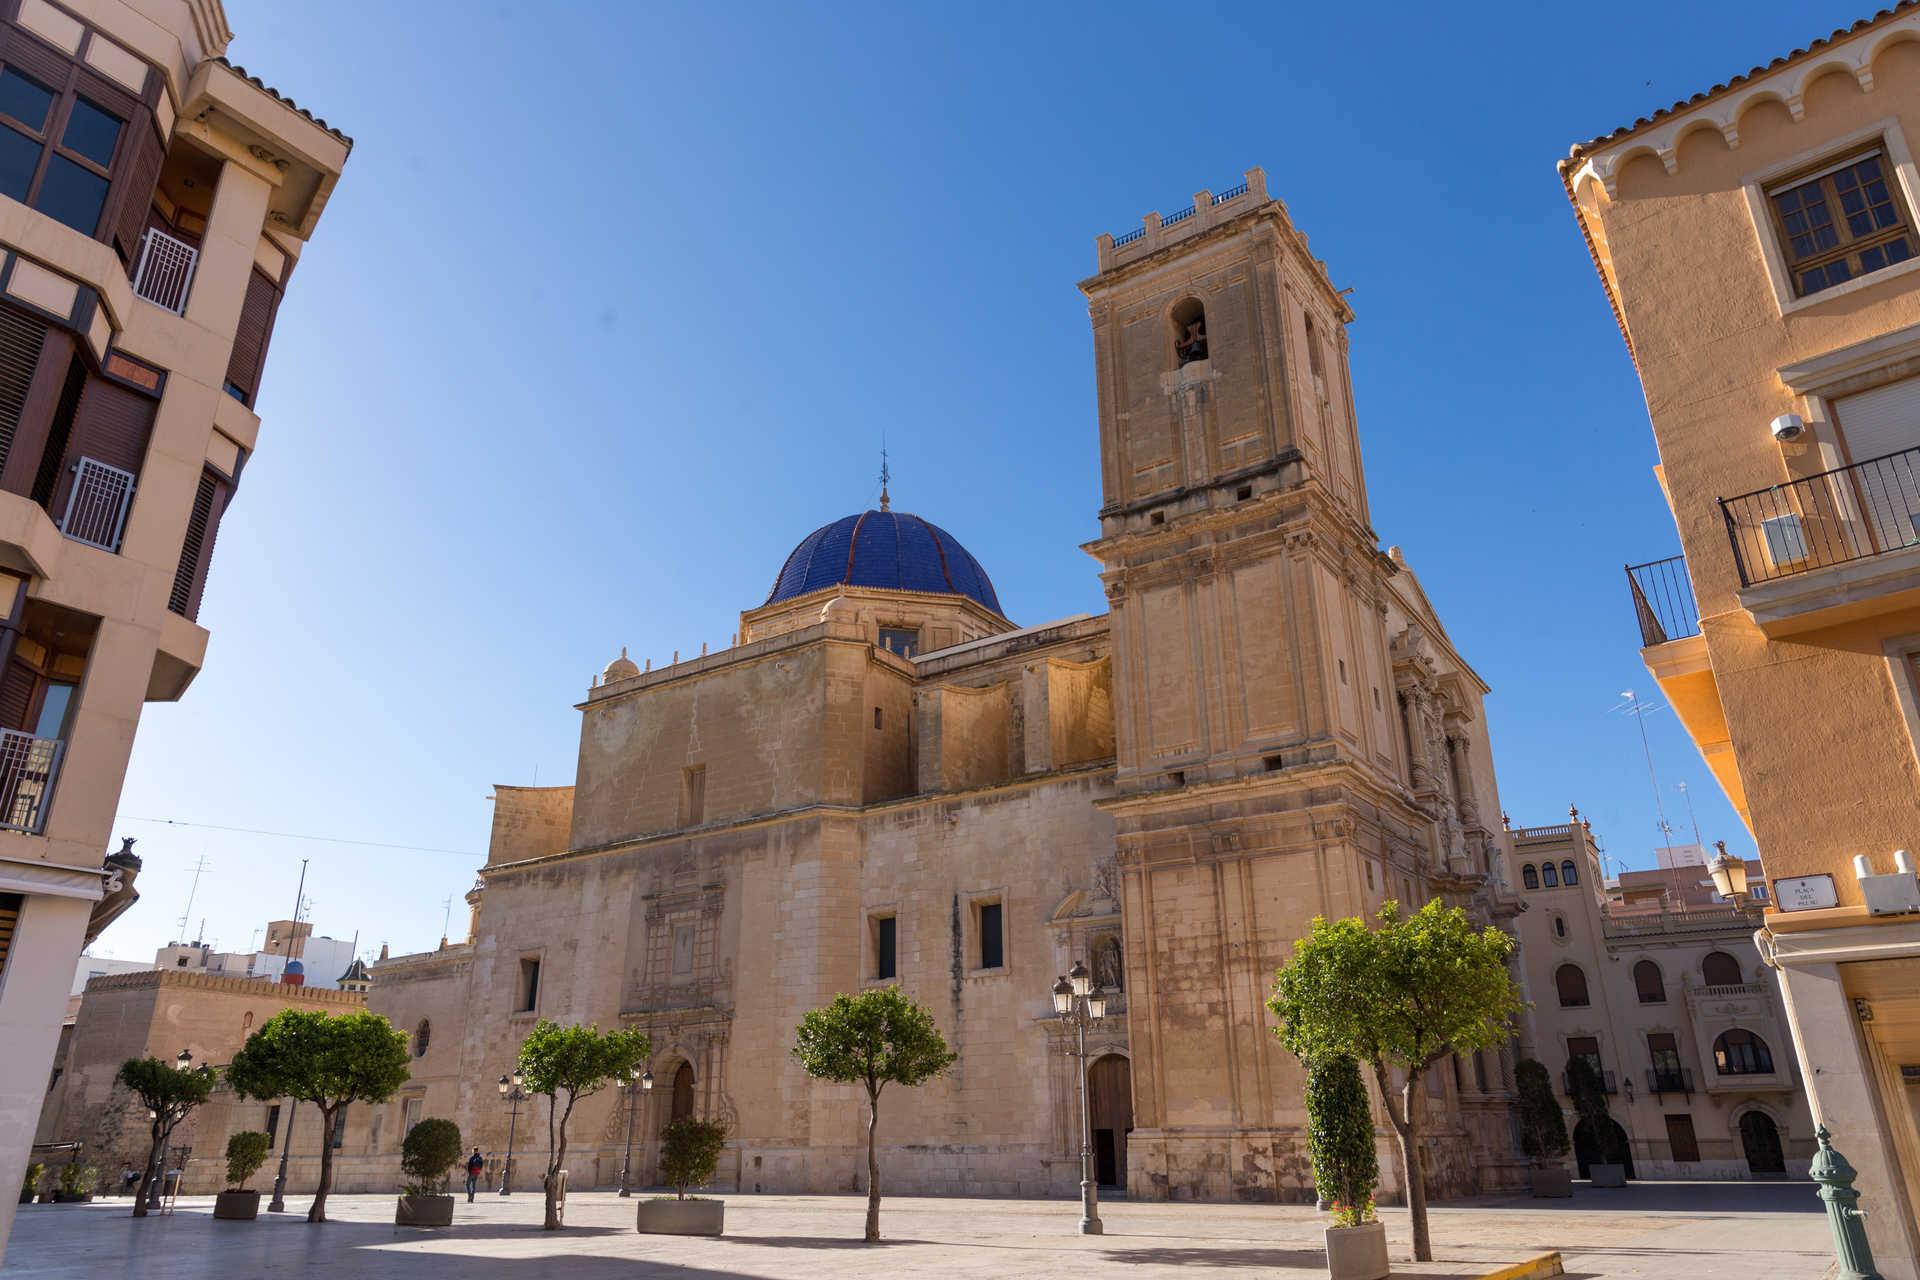 https://multimedia.comunitatvalenciana.com/E0F43BFD77784FC6AB59663DA8195136/img/7ACCA4F7B5D34024BACE9C813AB788BB/Basilica_de_Santa_Maria-_MG_9063.jpg?responsive